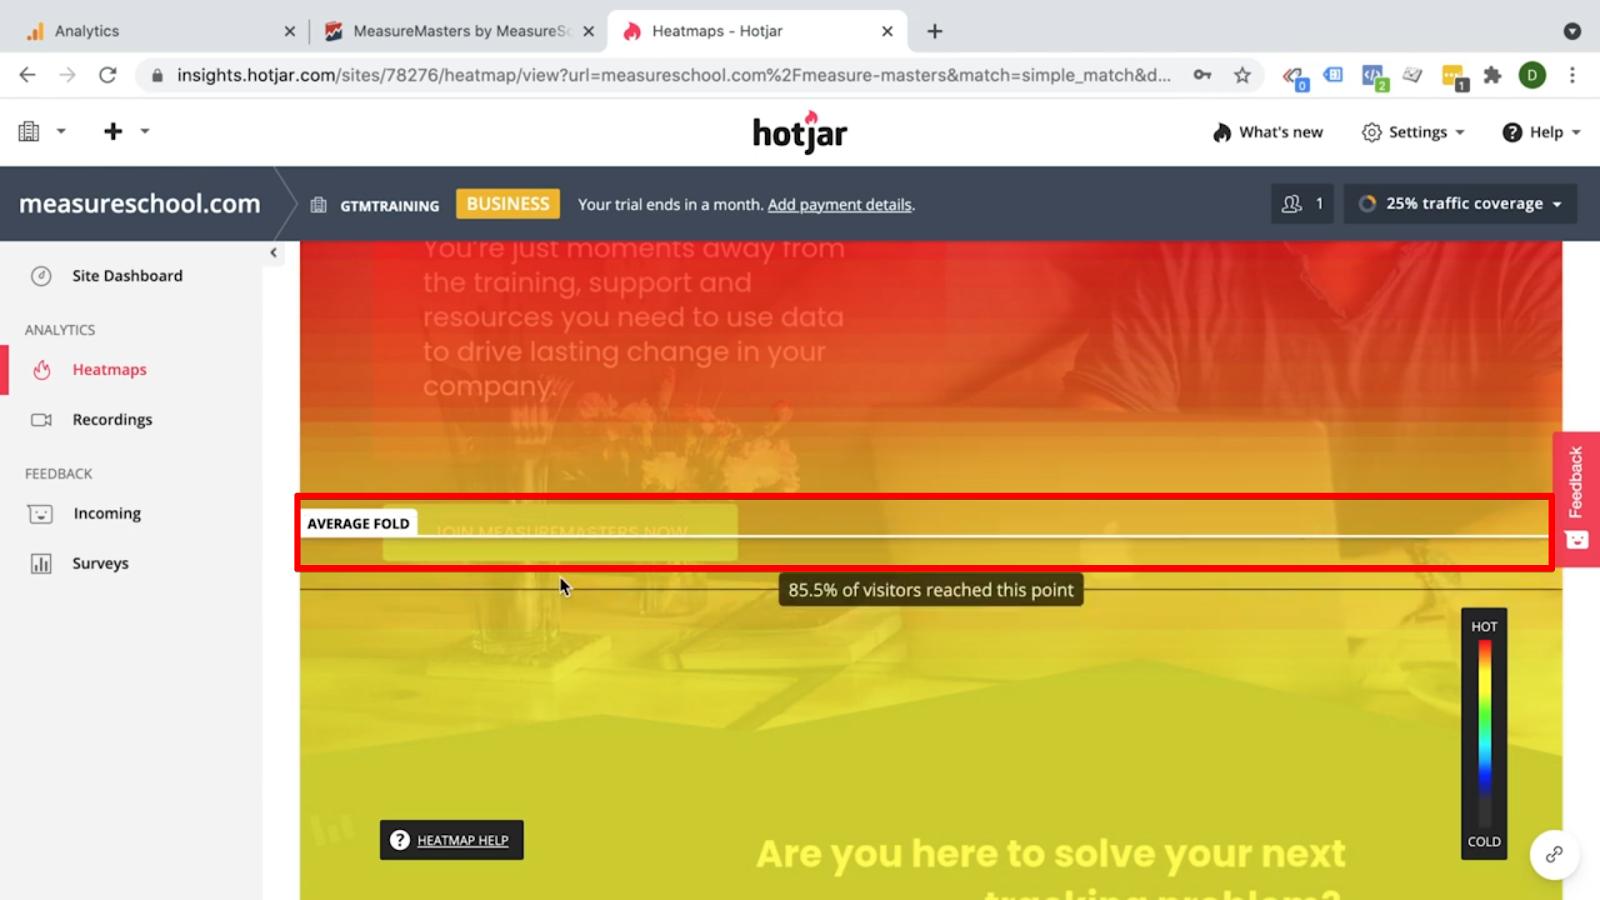 Hotjar - Heatmaps - Average Fold